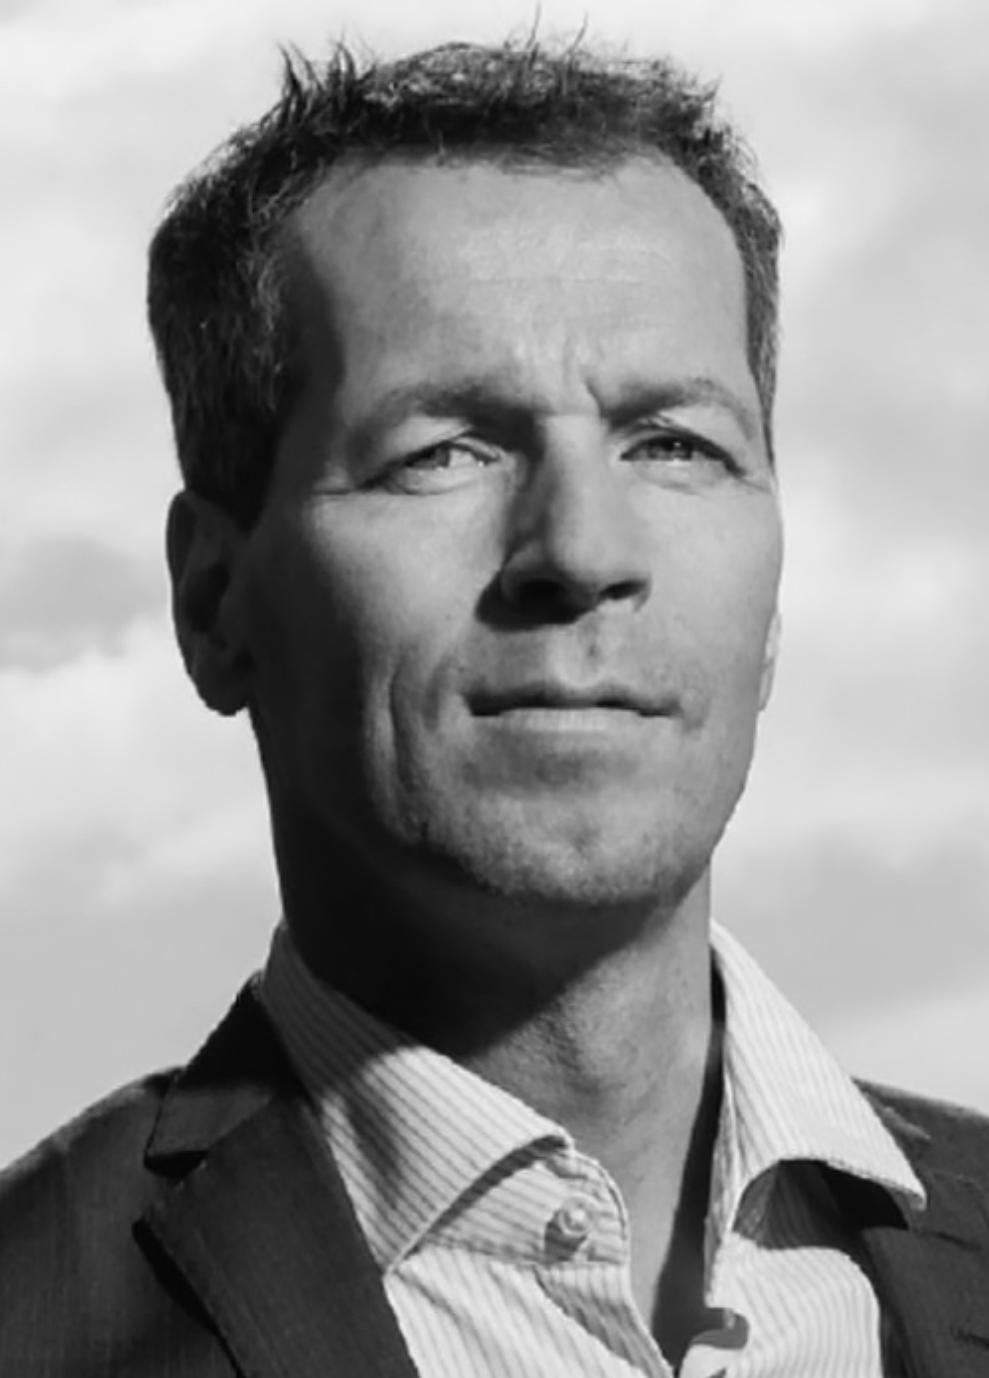 Juha Stenberg